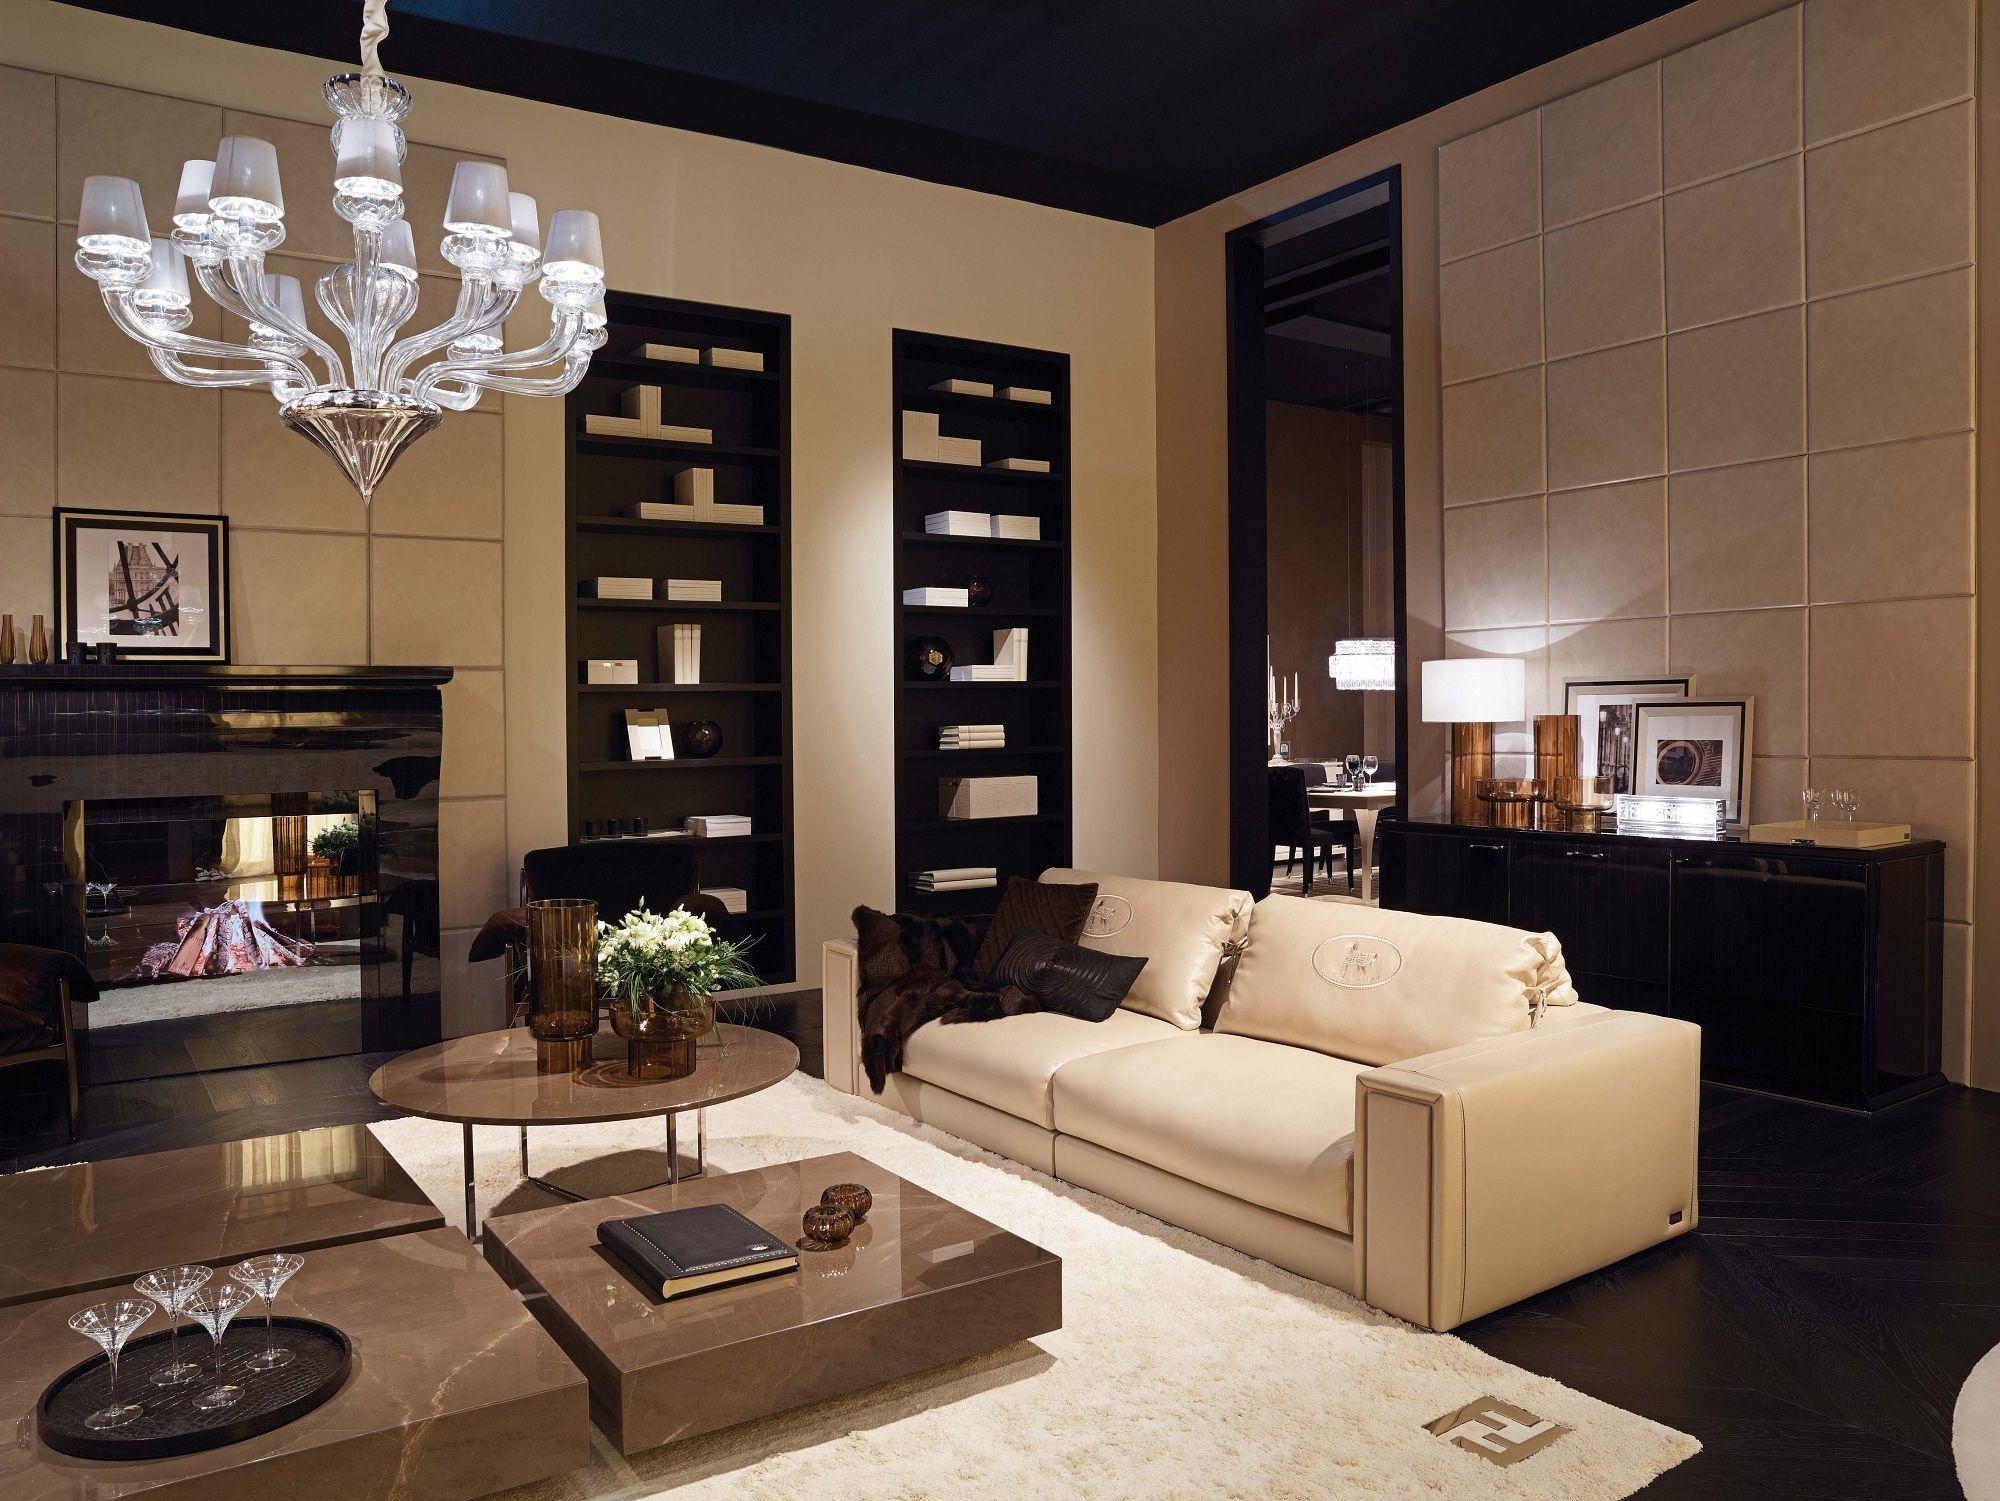 Fendi Casau0027s Showroom In New York City | Top New York Hotels | Pinterest |  Fendi, Showroom And Living Rooms